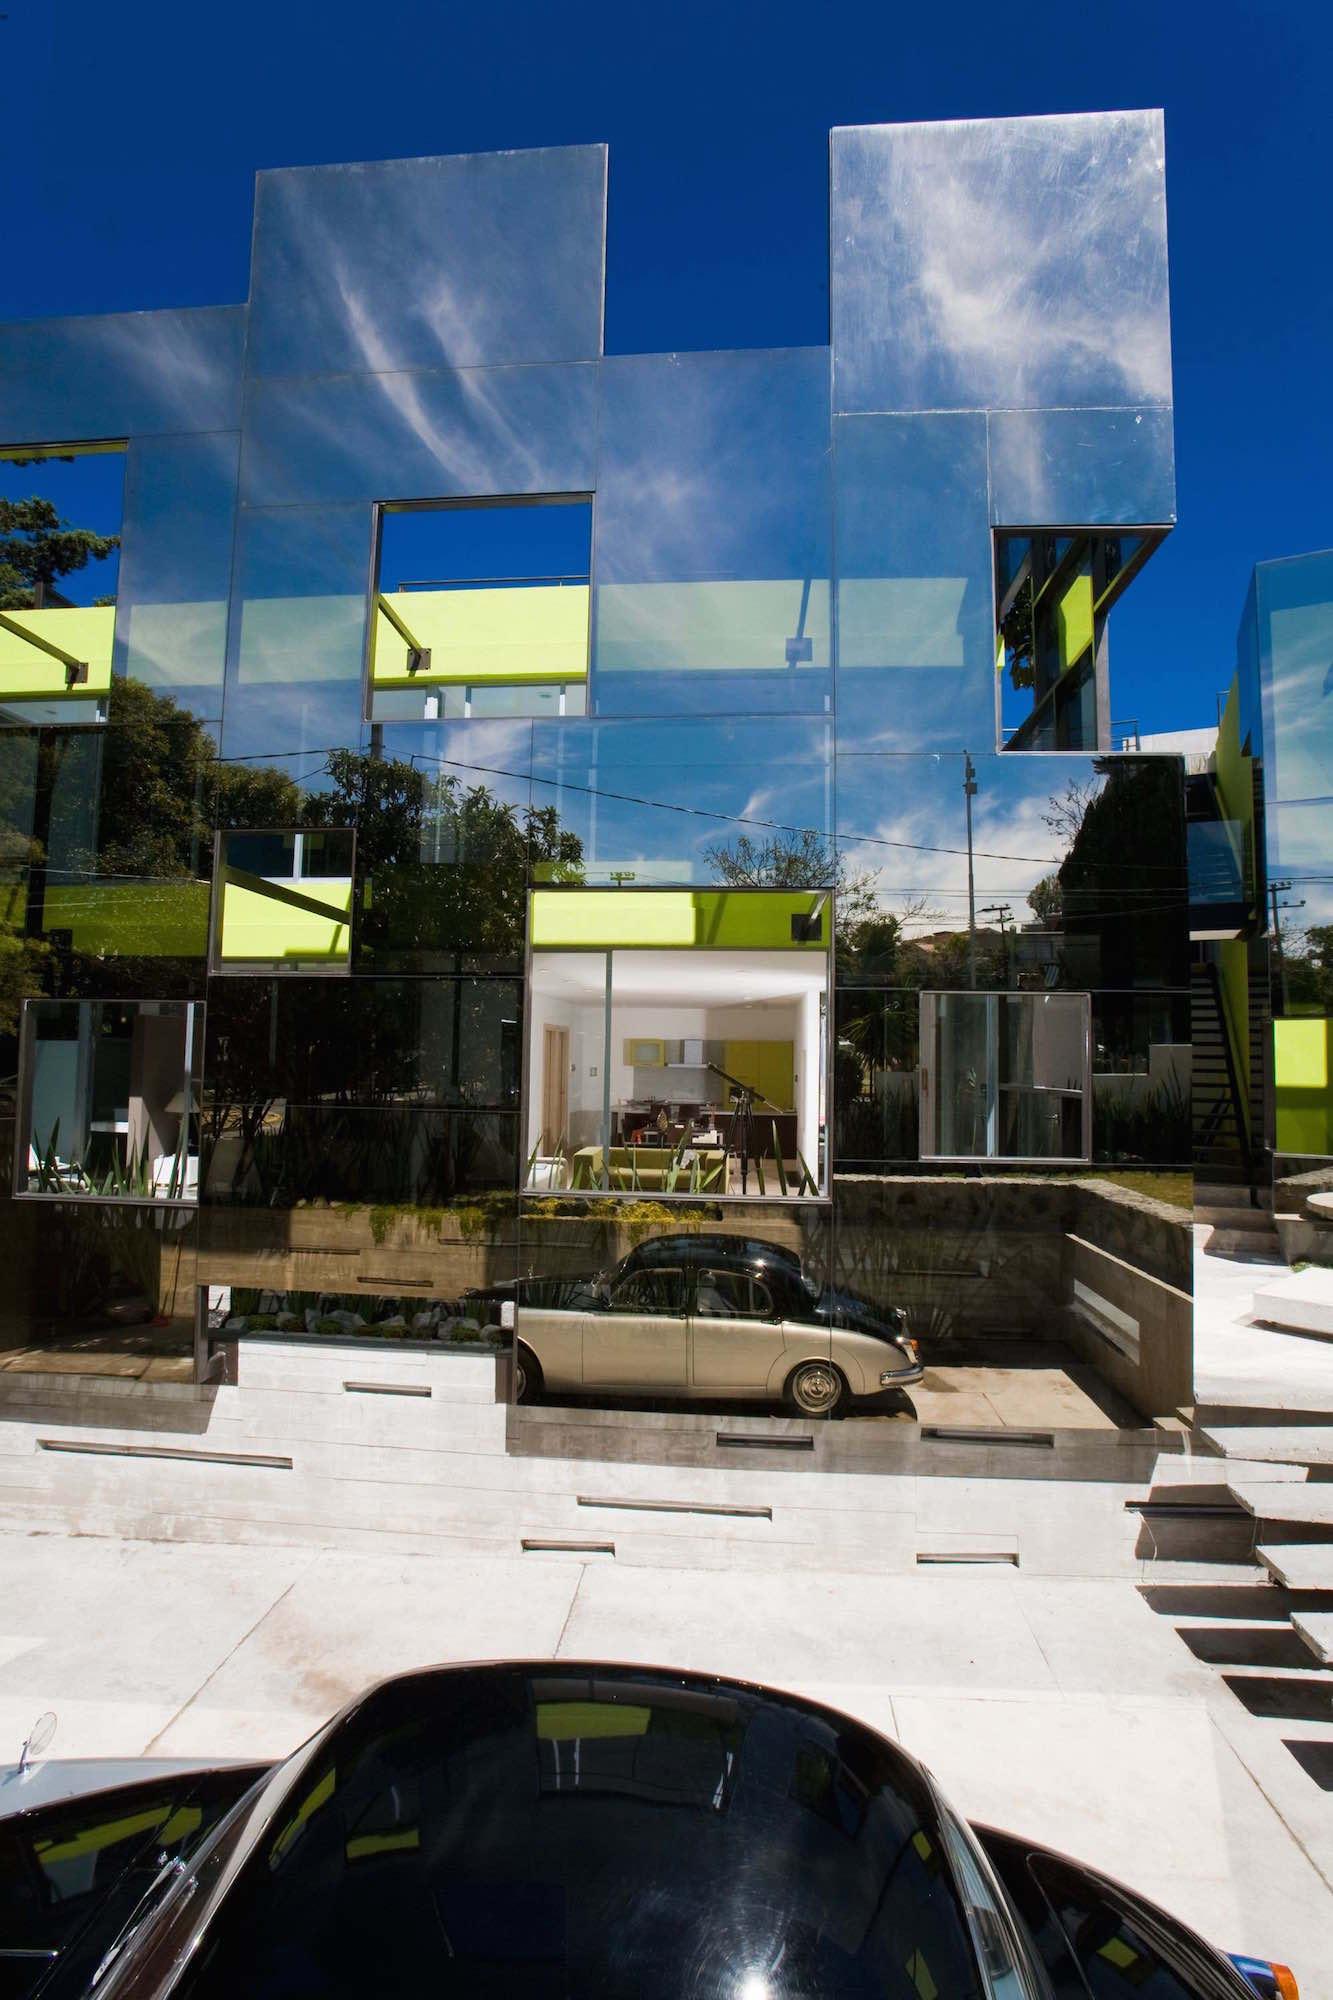 51a8db2bb3fc4b10be00043d_trevox-223-craft-arquitectos_20